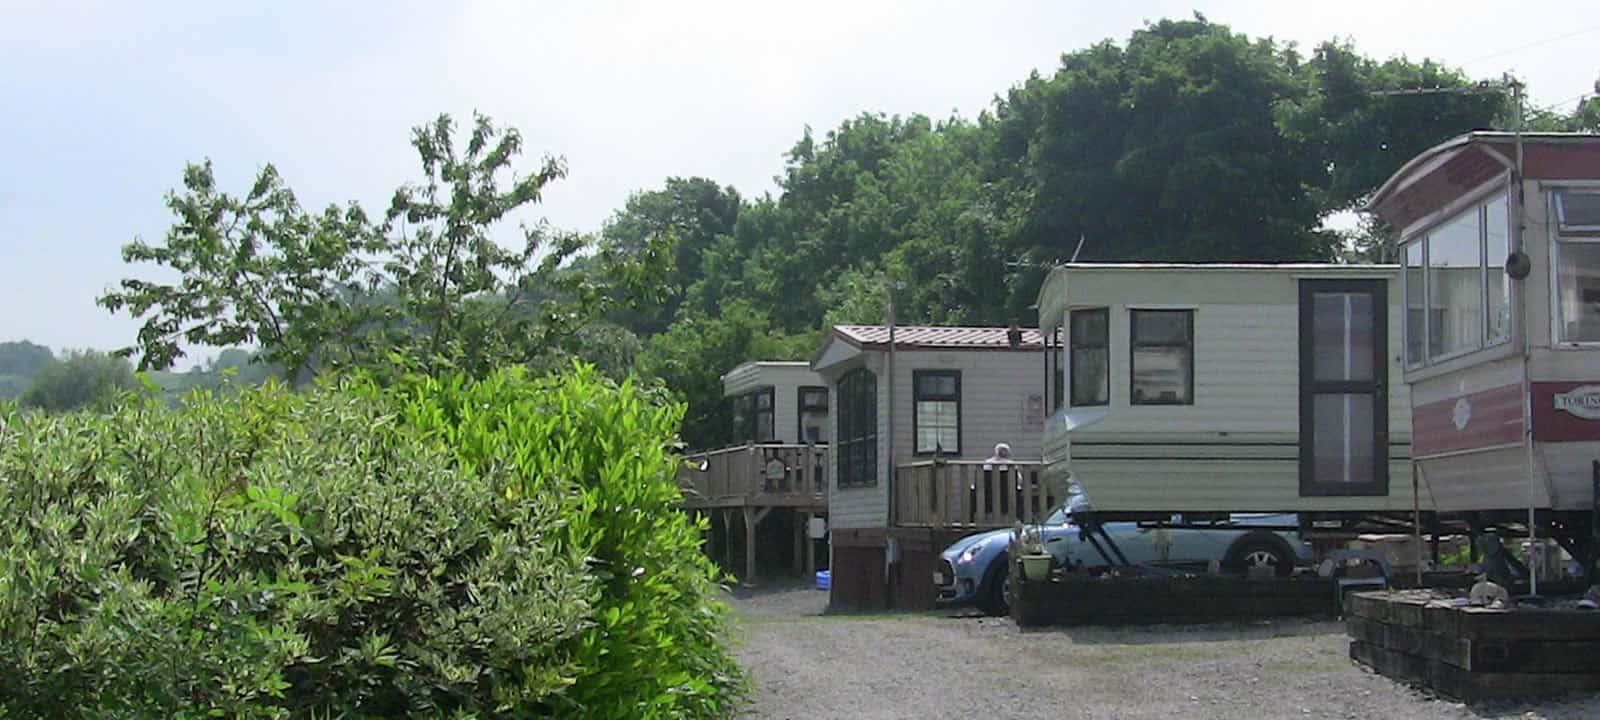 caravan park denbighshire